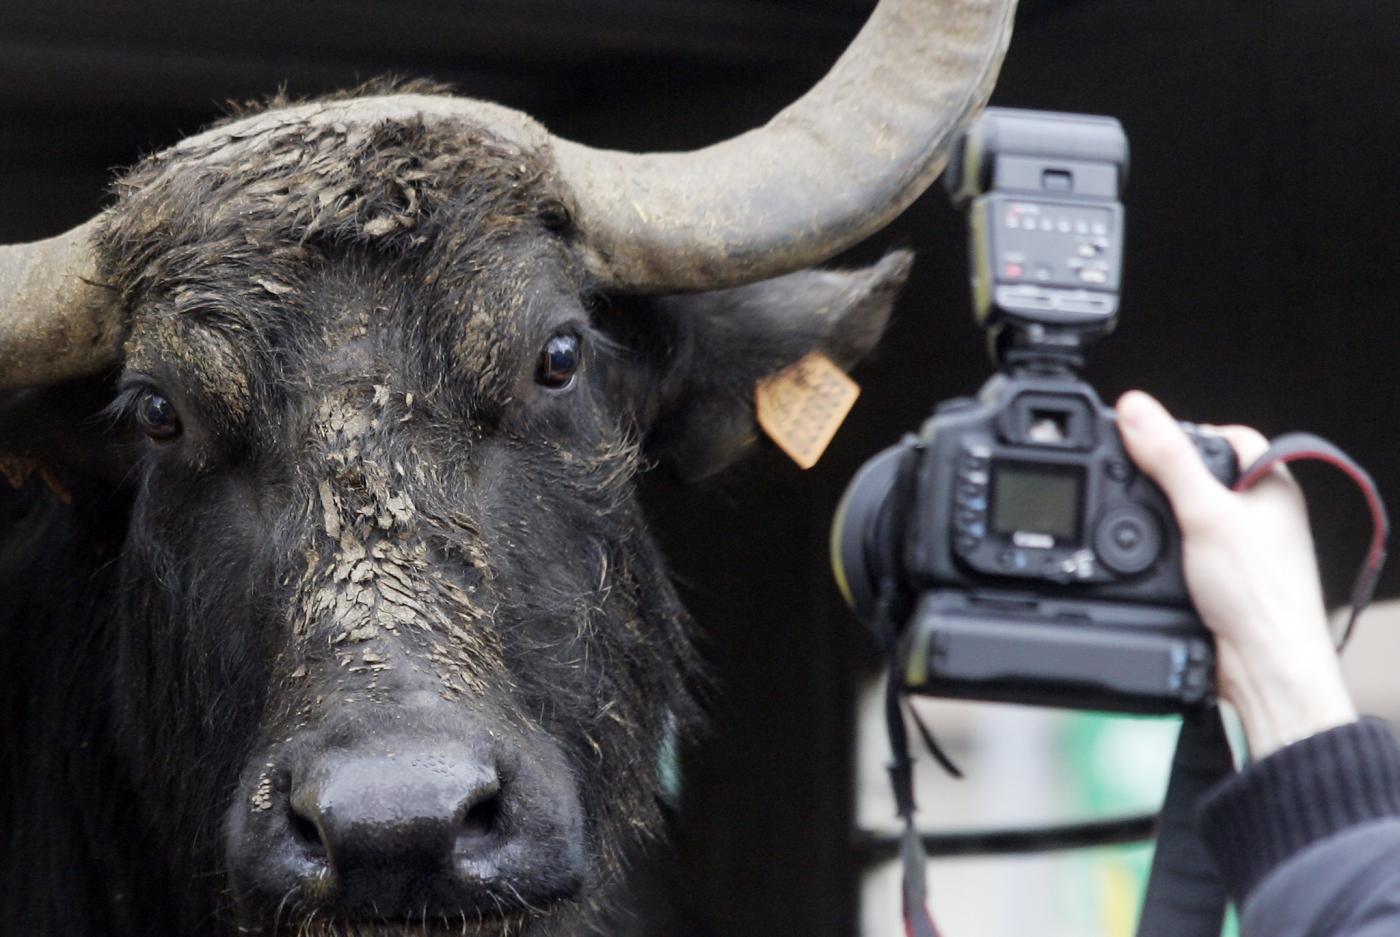 perché si dice bufala